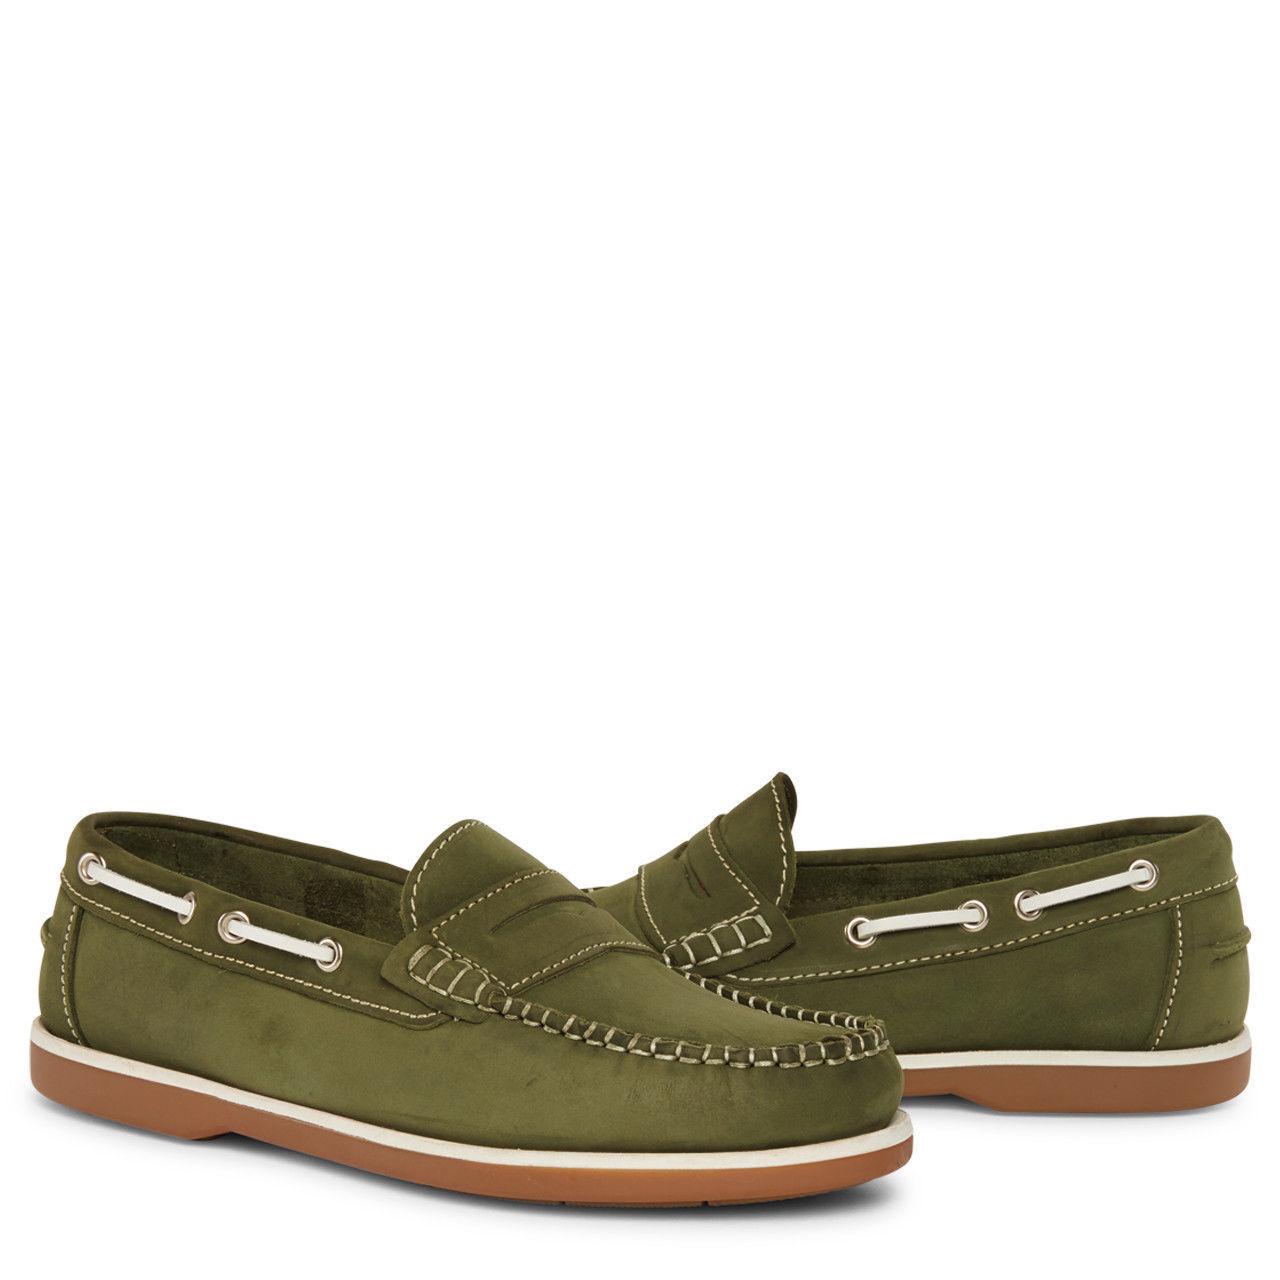 Kanyon Florencia Damas verde Informal Cuero Barco Cubierta Cubierta Cubierta Tallas de Zapatos 4-7 Reino Unido  centro comercial de moda